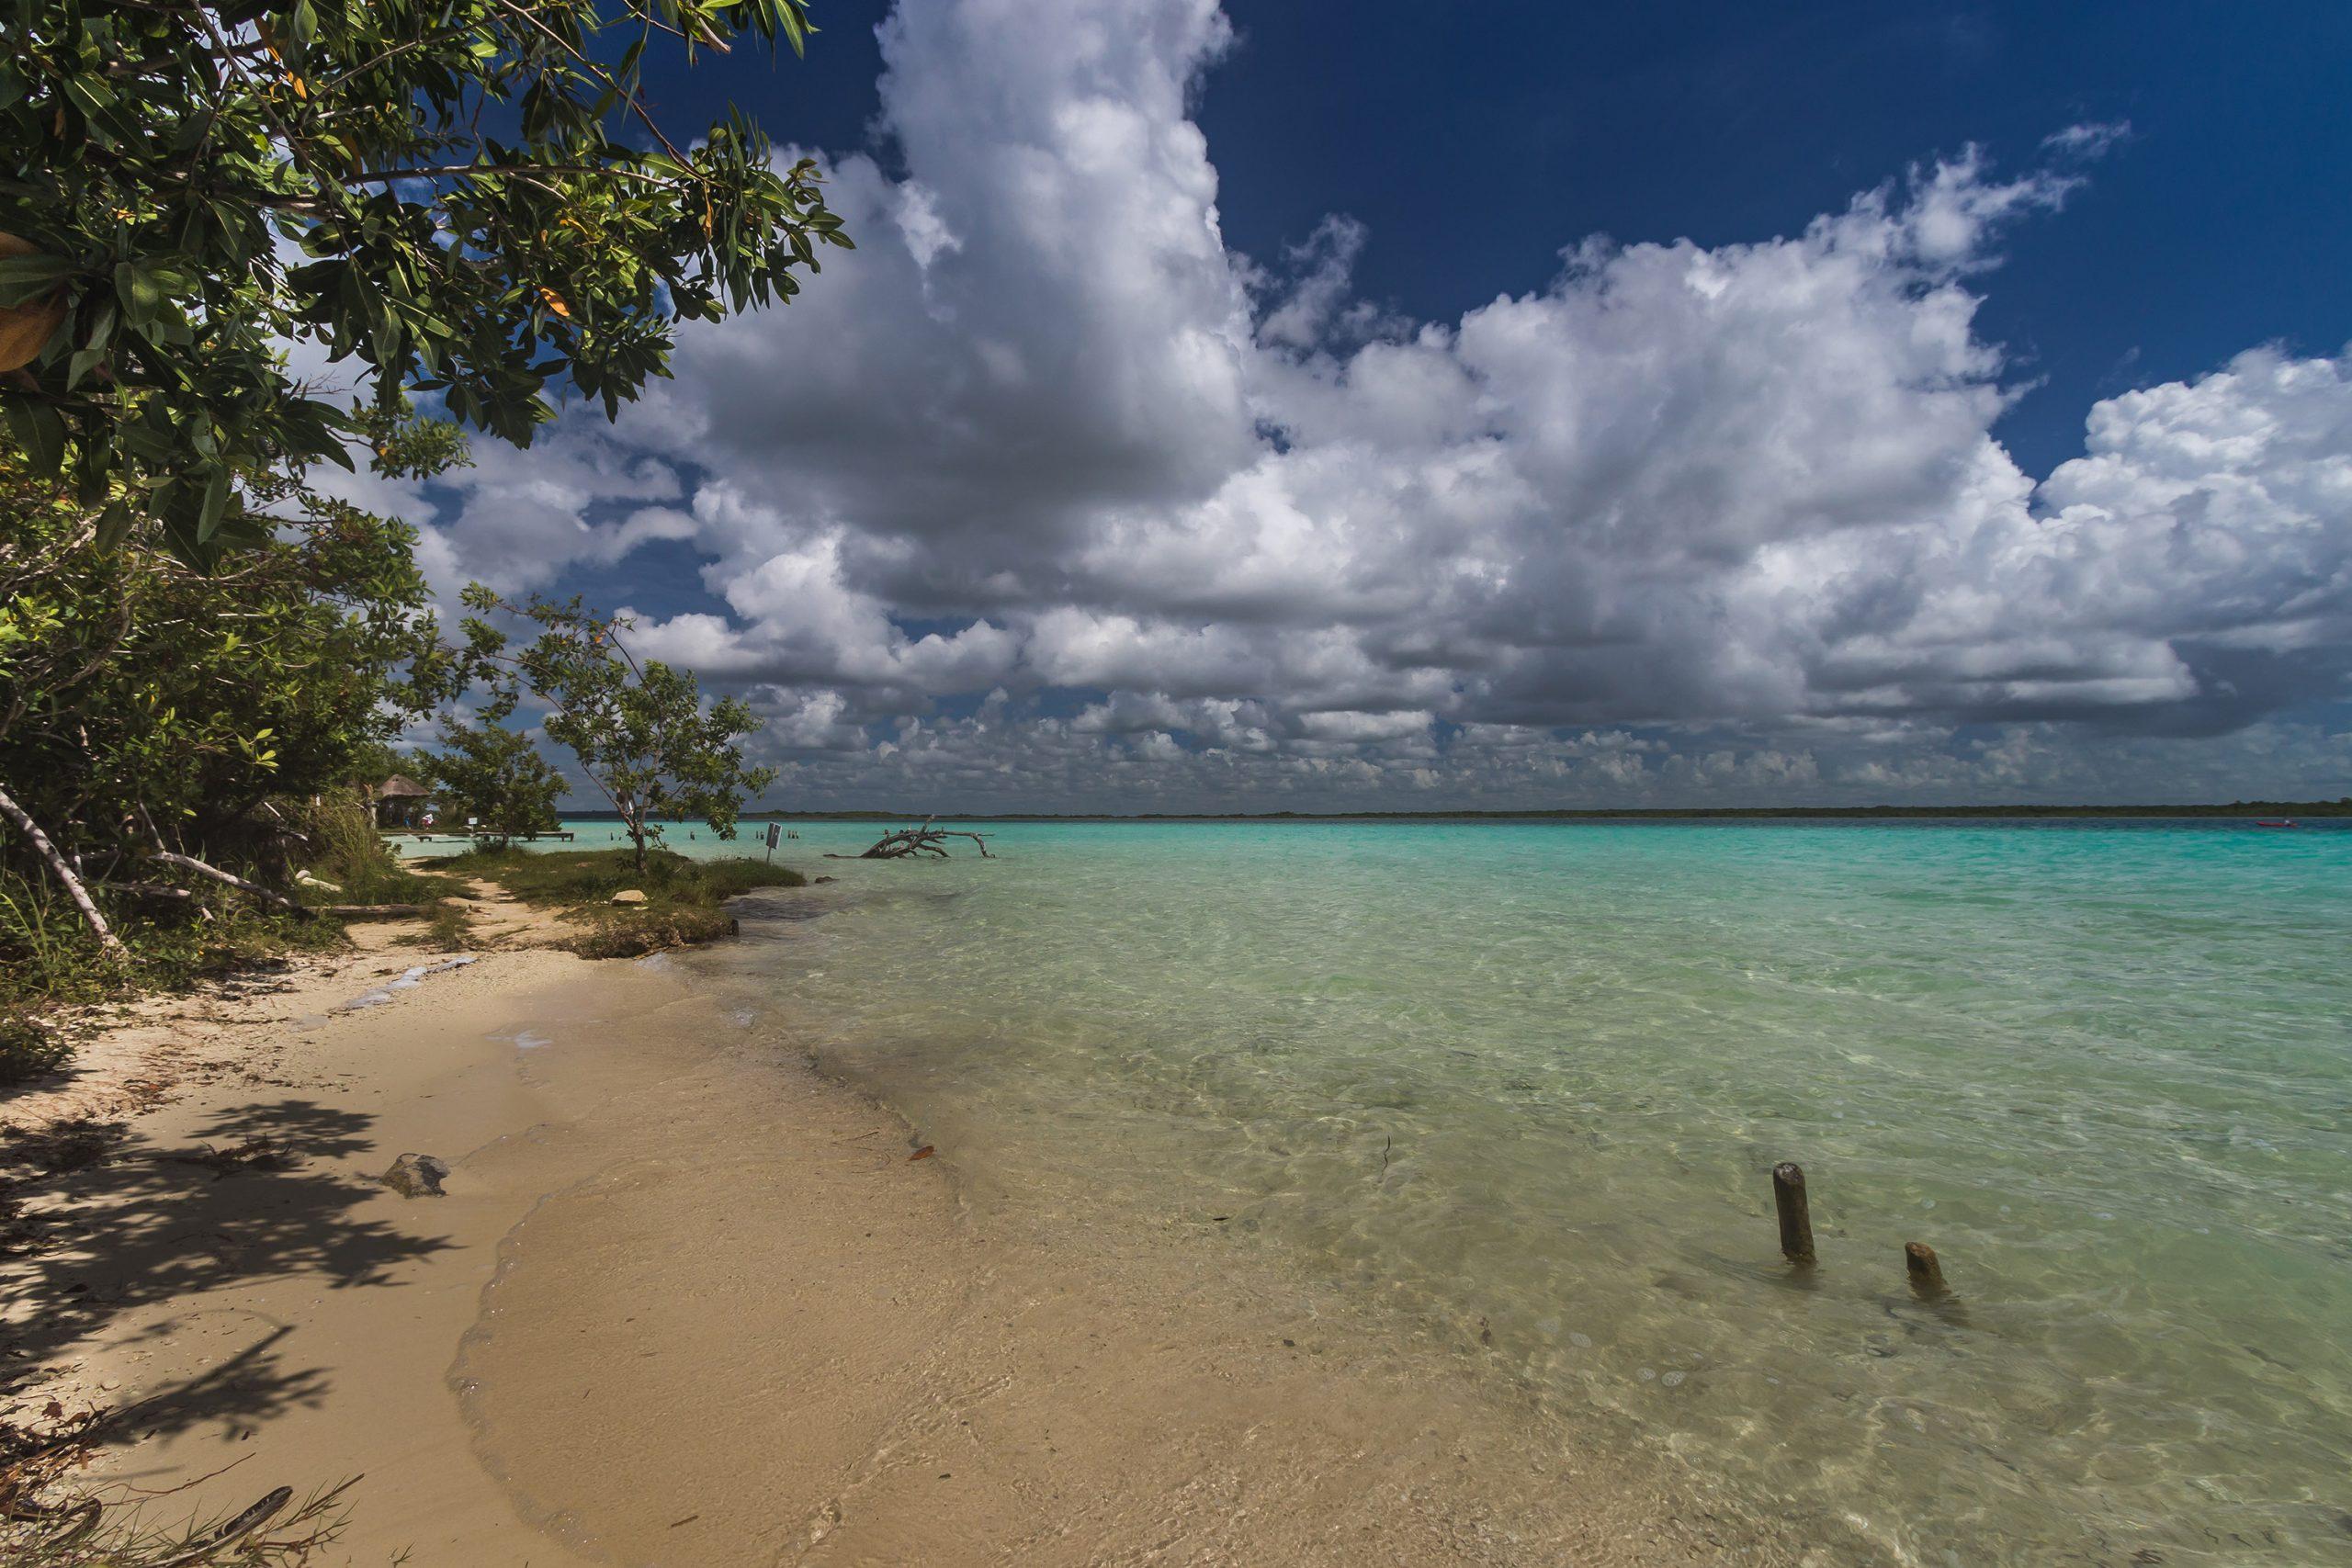 Bacalar - Plage et eau turquoise - Marie Naudon